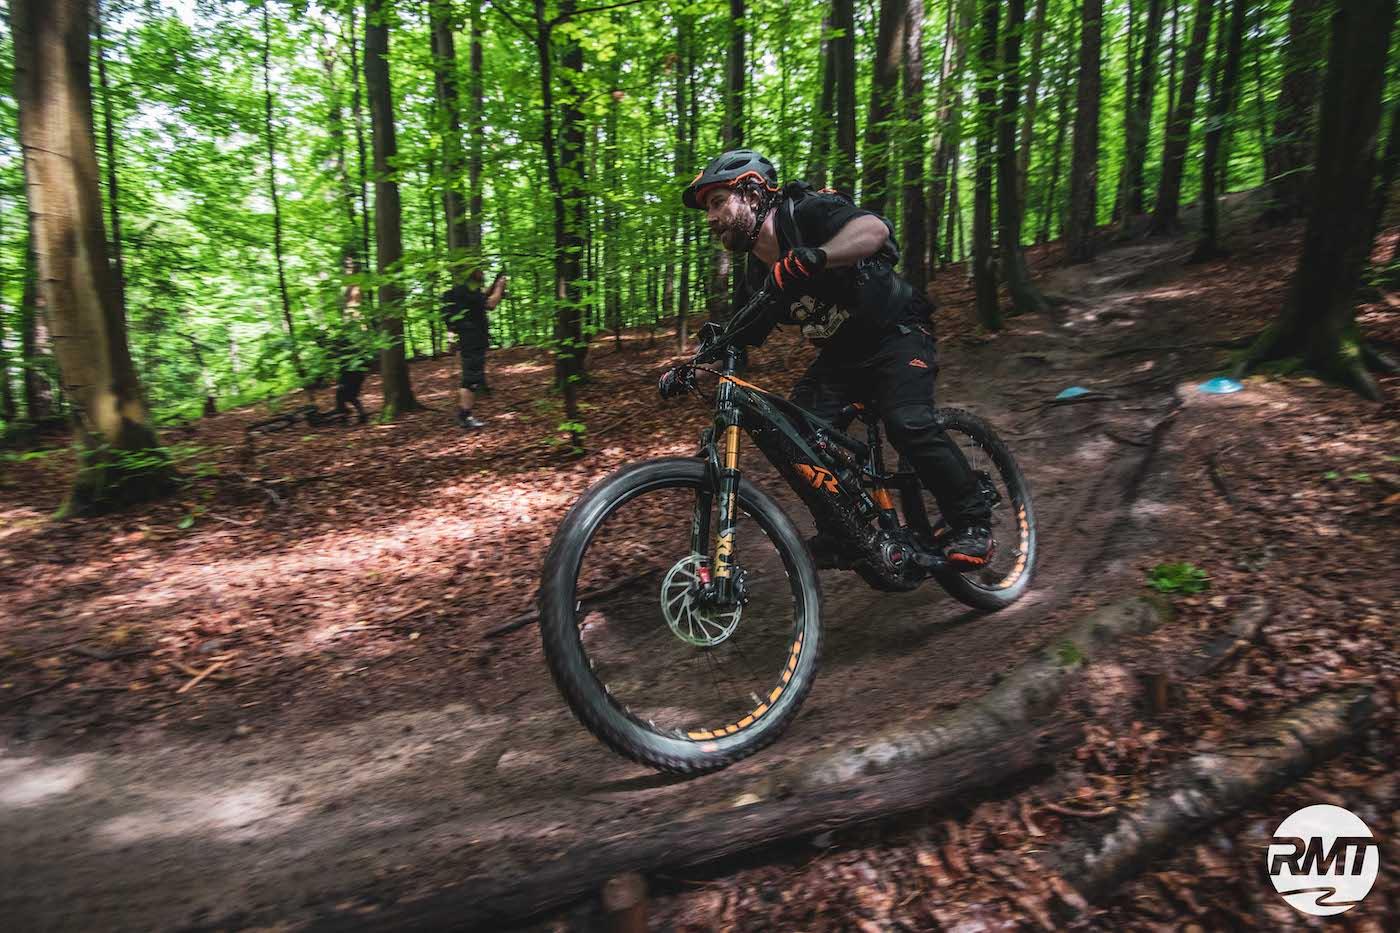 eMTB eBike Fortgeschritten Fahrtechnik Kurs in Siegen - Rock my Trail Bikeschule314